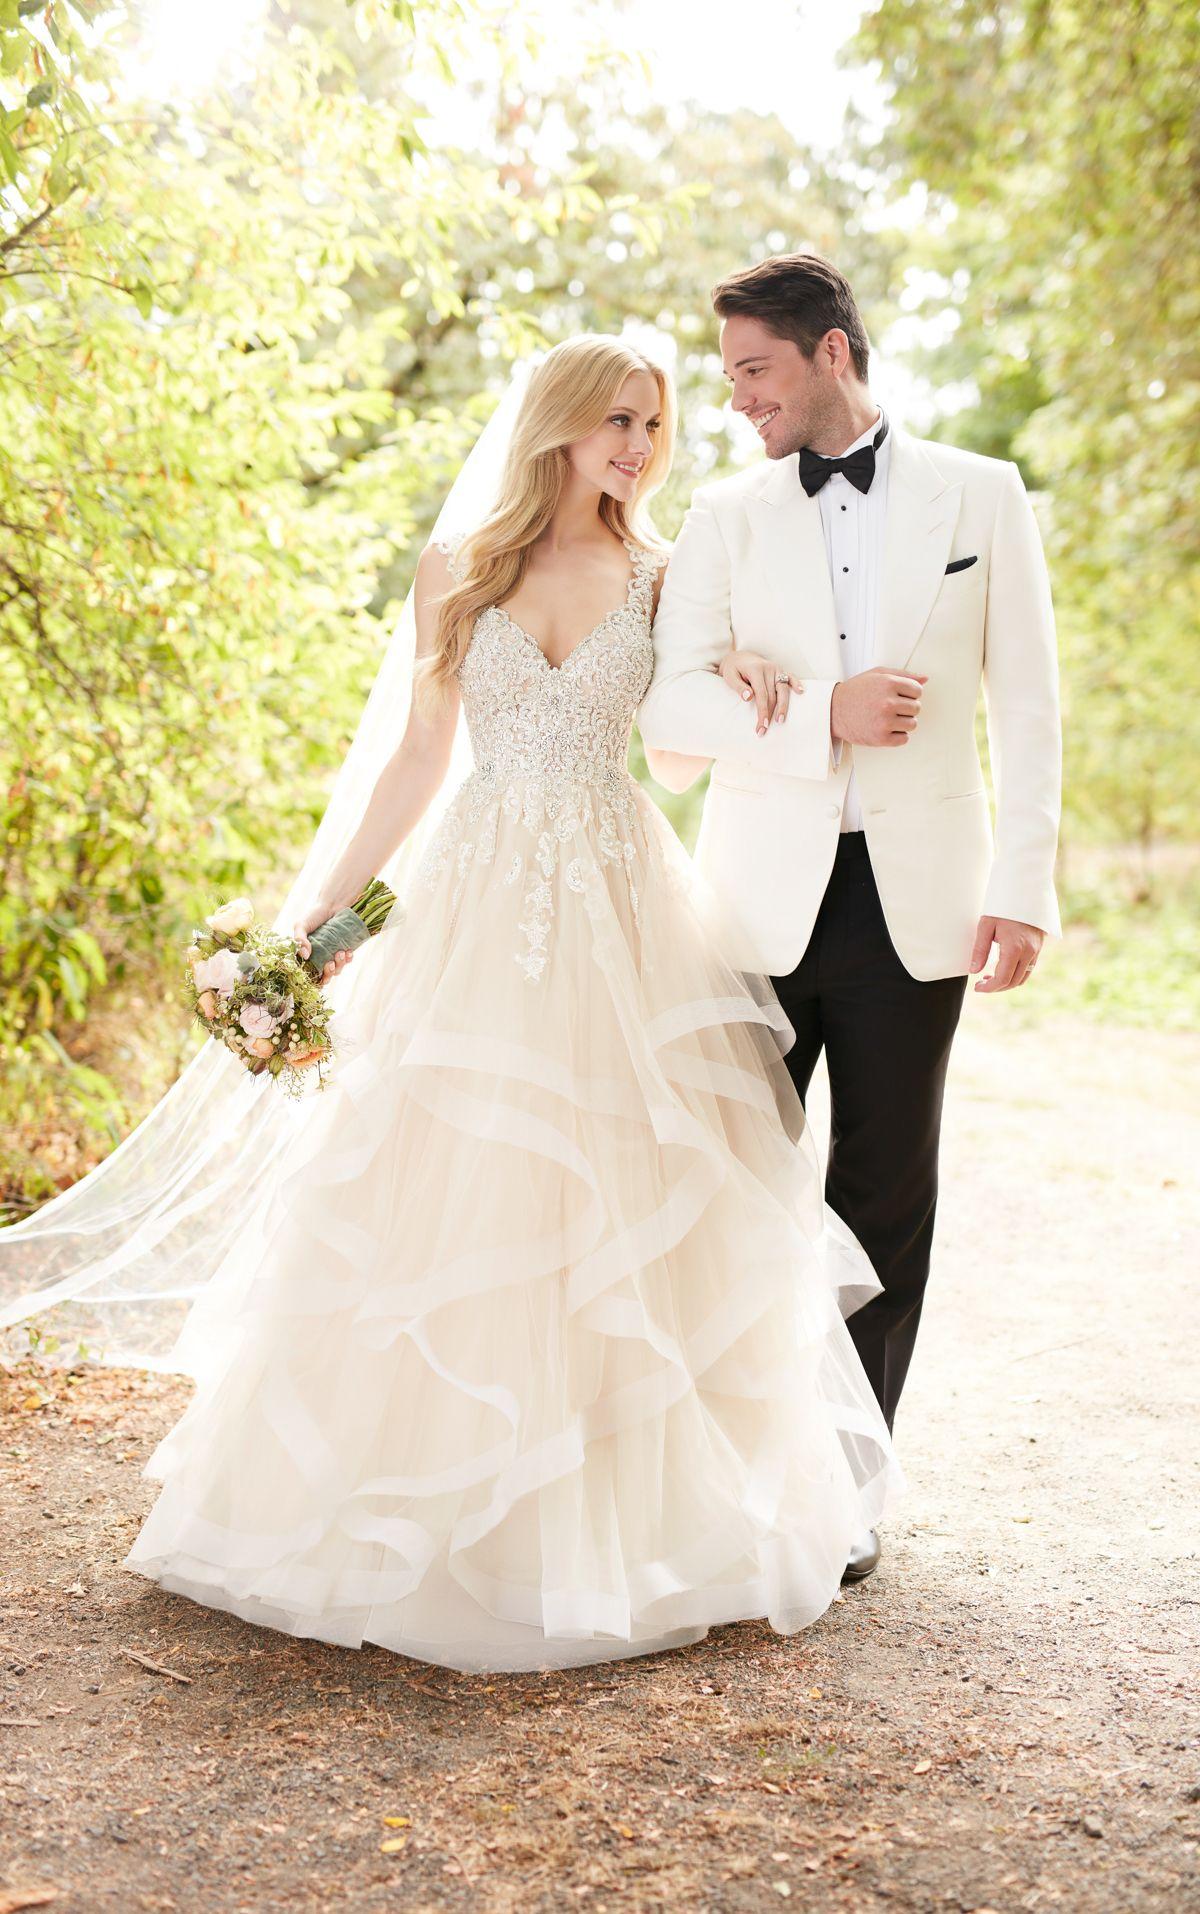 Princess Cut Wedding Dress With Layered Tulle Skirt